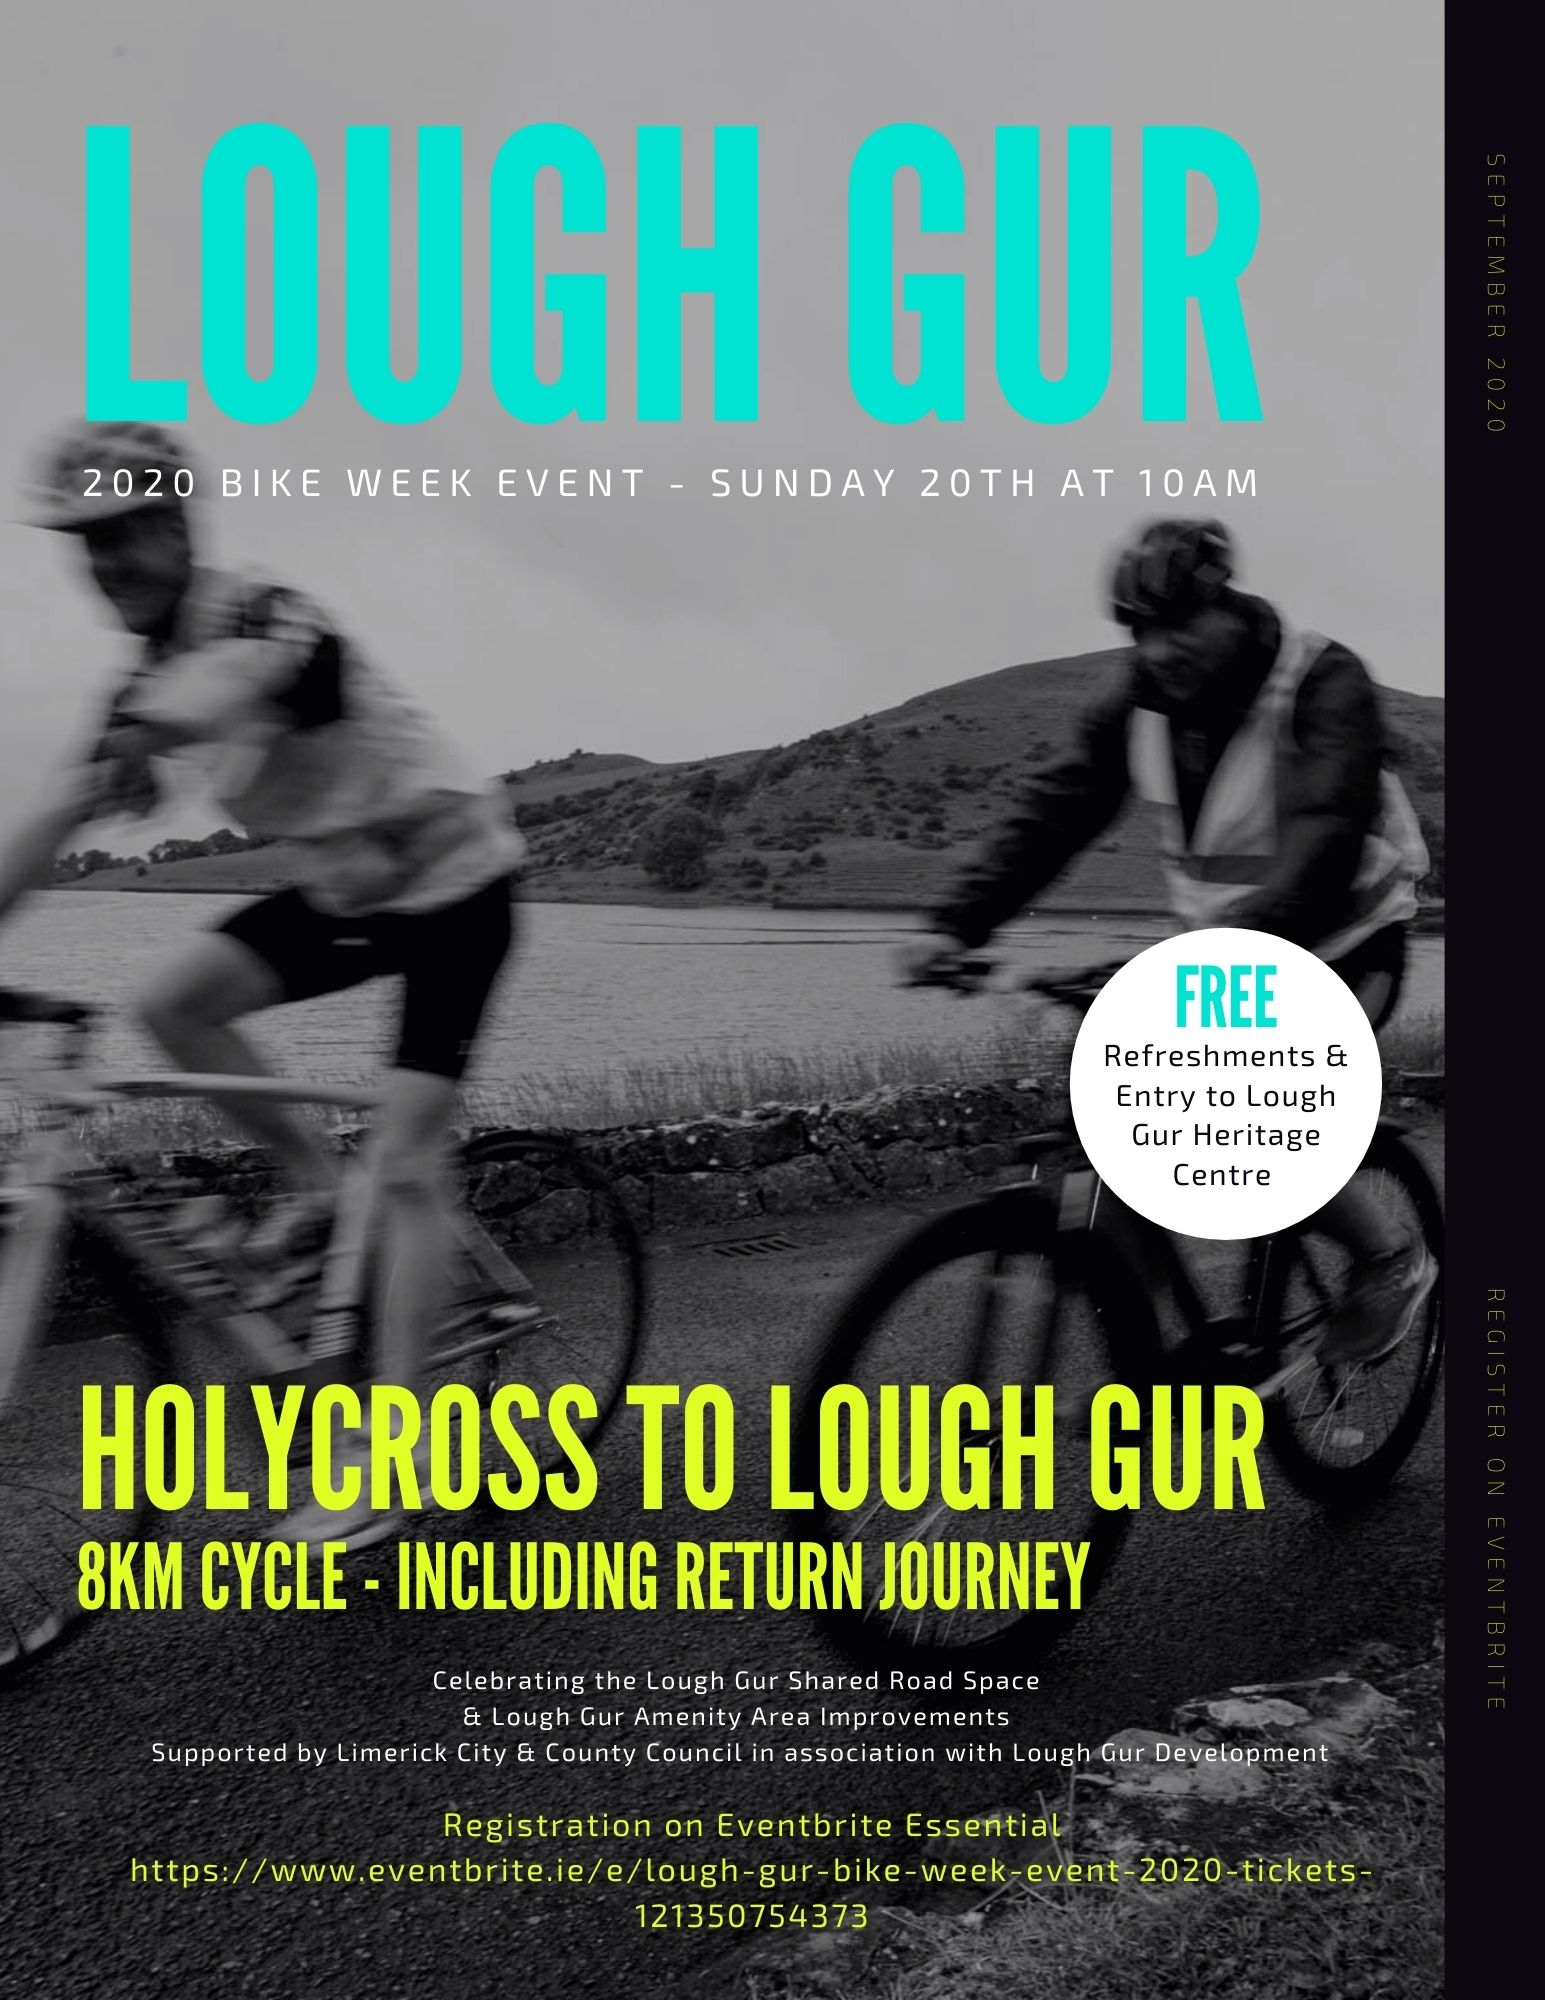 Lough Gur Bike Week Event 2020